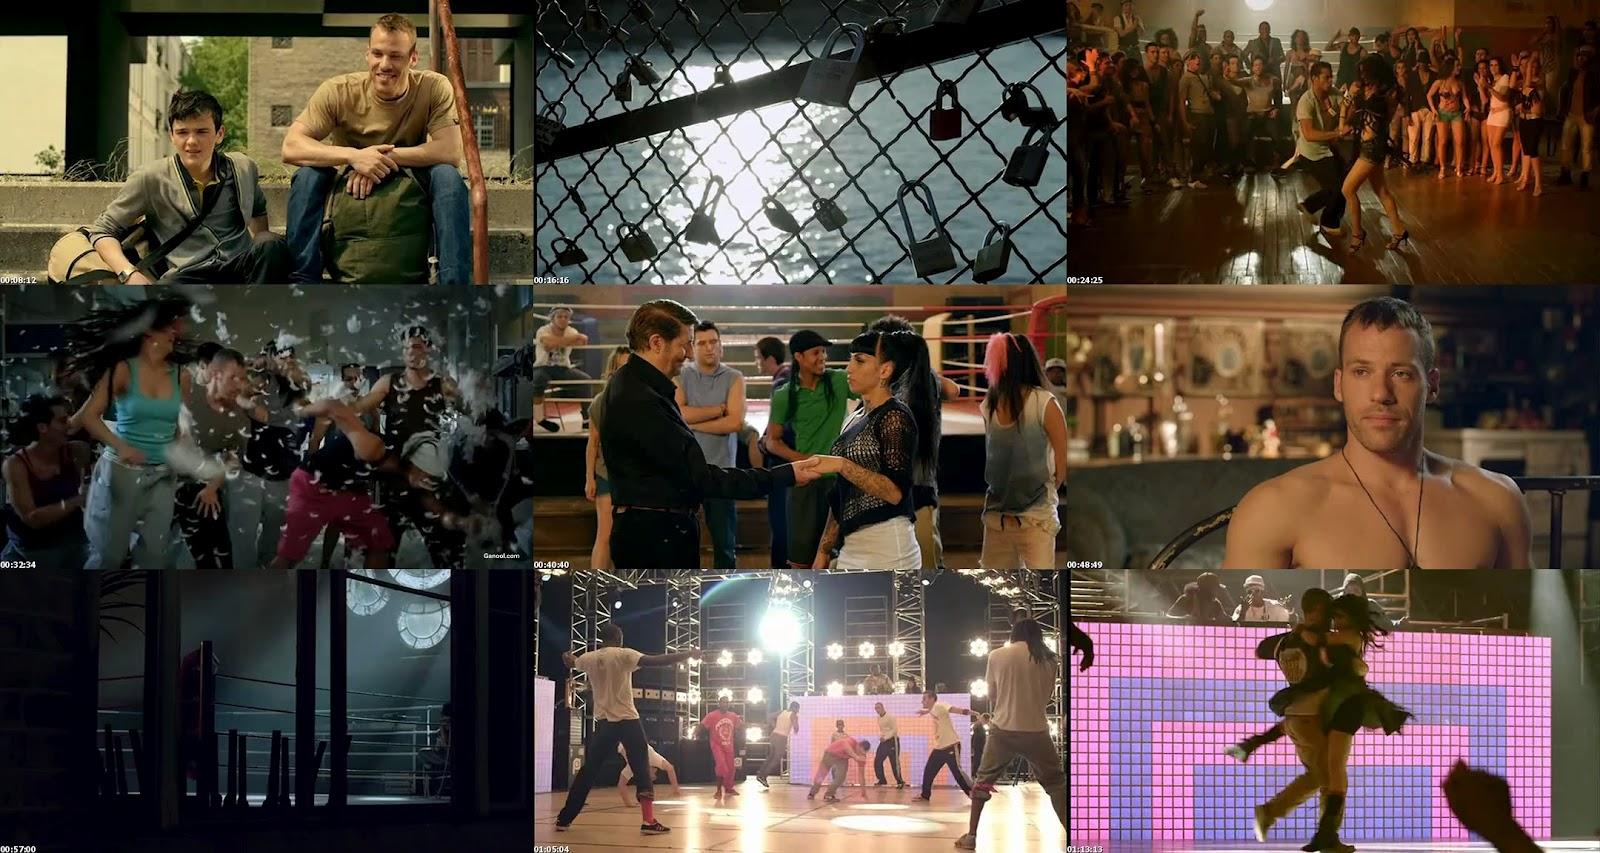 Streetdance 2 2012 Brrip